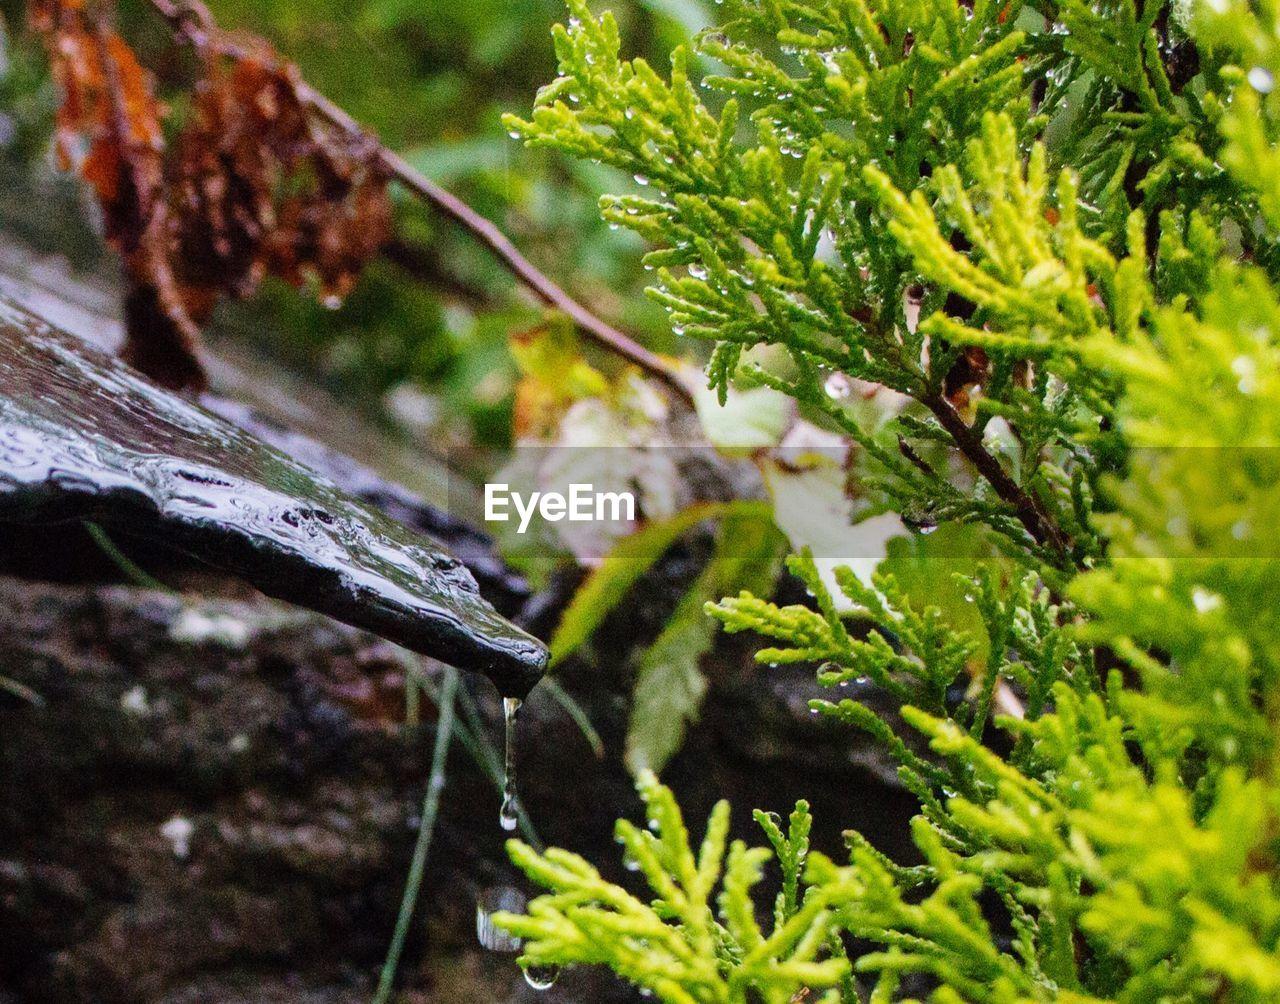 Plants and rock during rainy season